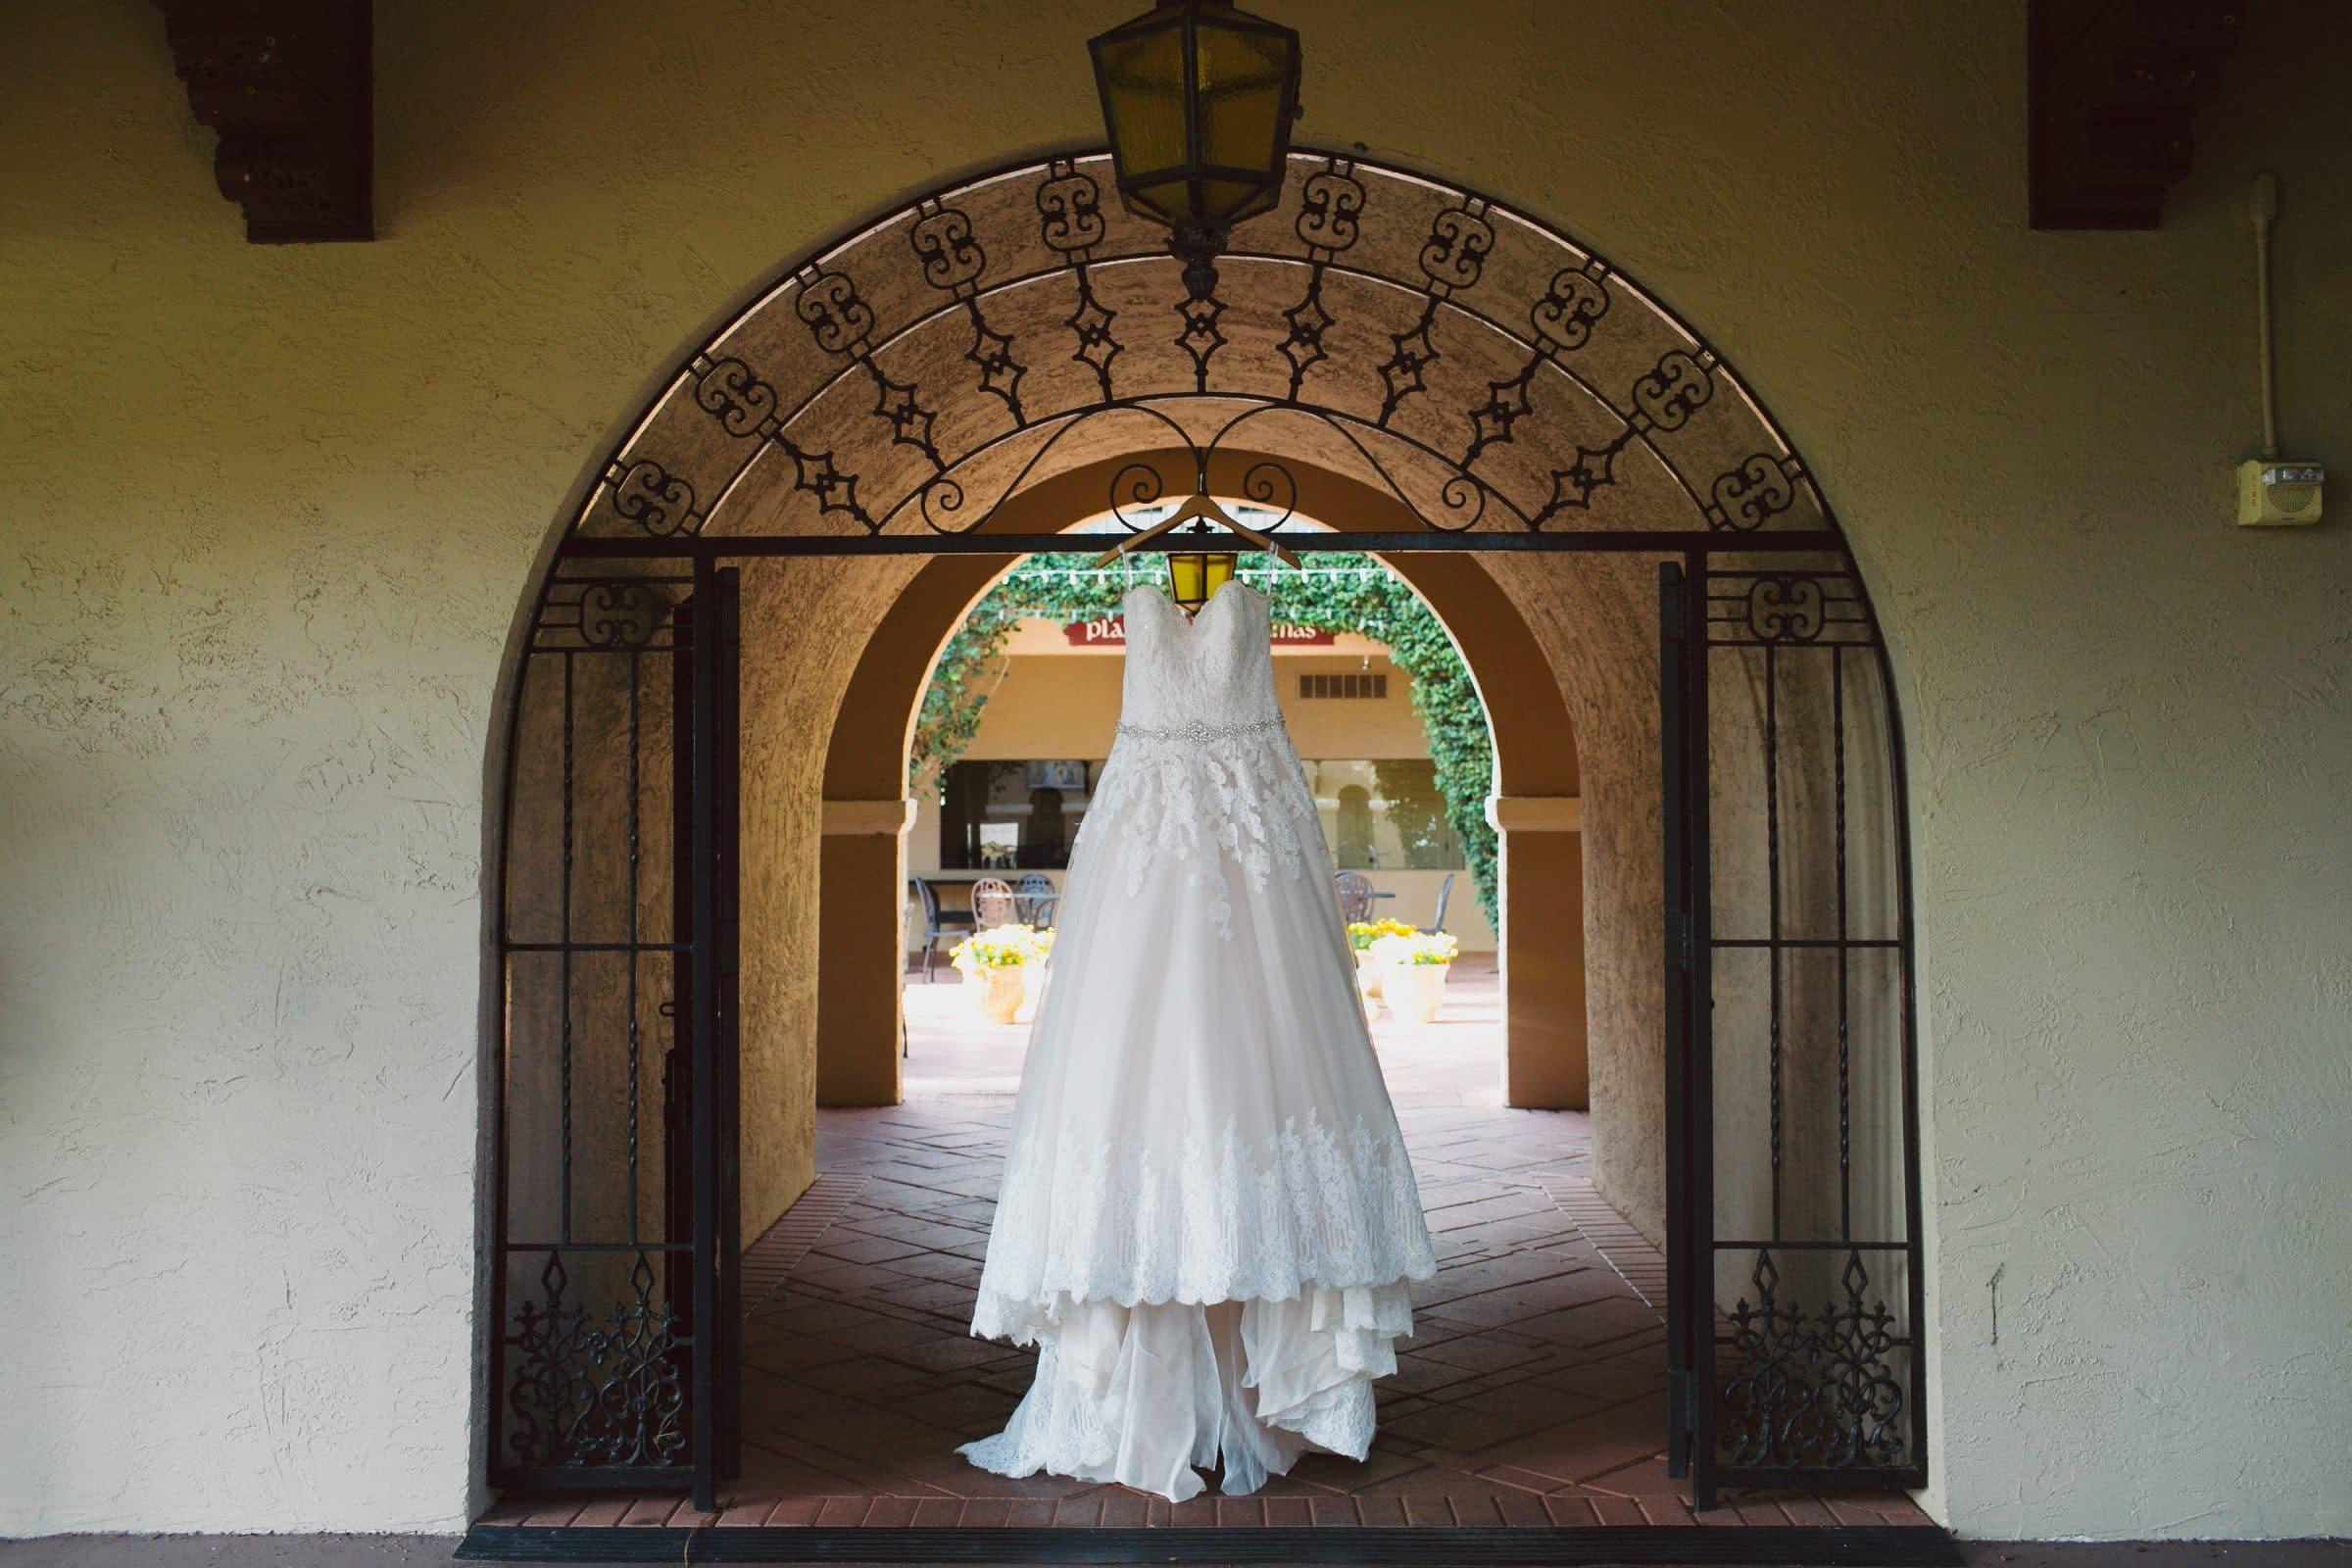 Dress Hanging on Iron Gate